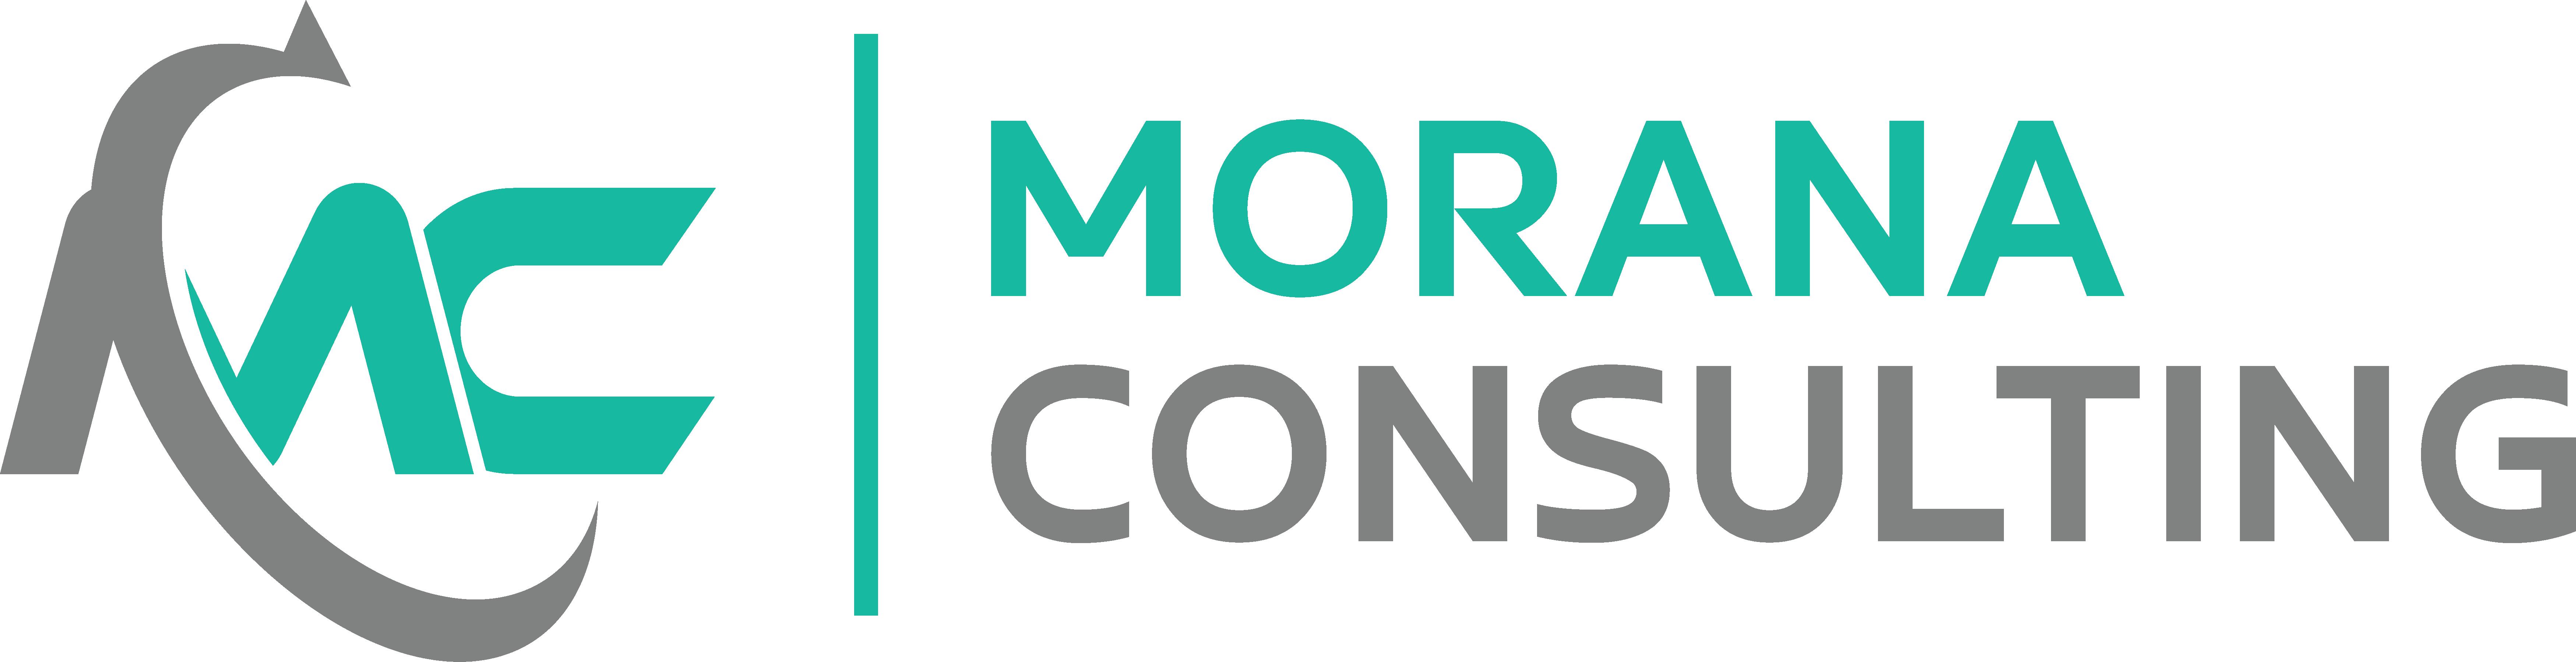 Morana consulting